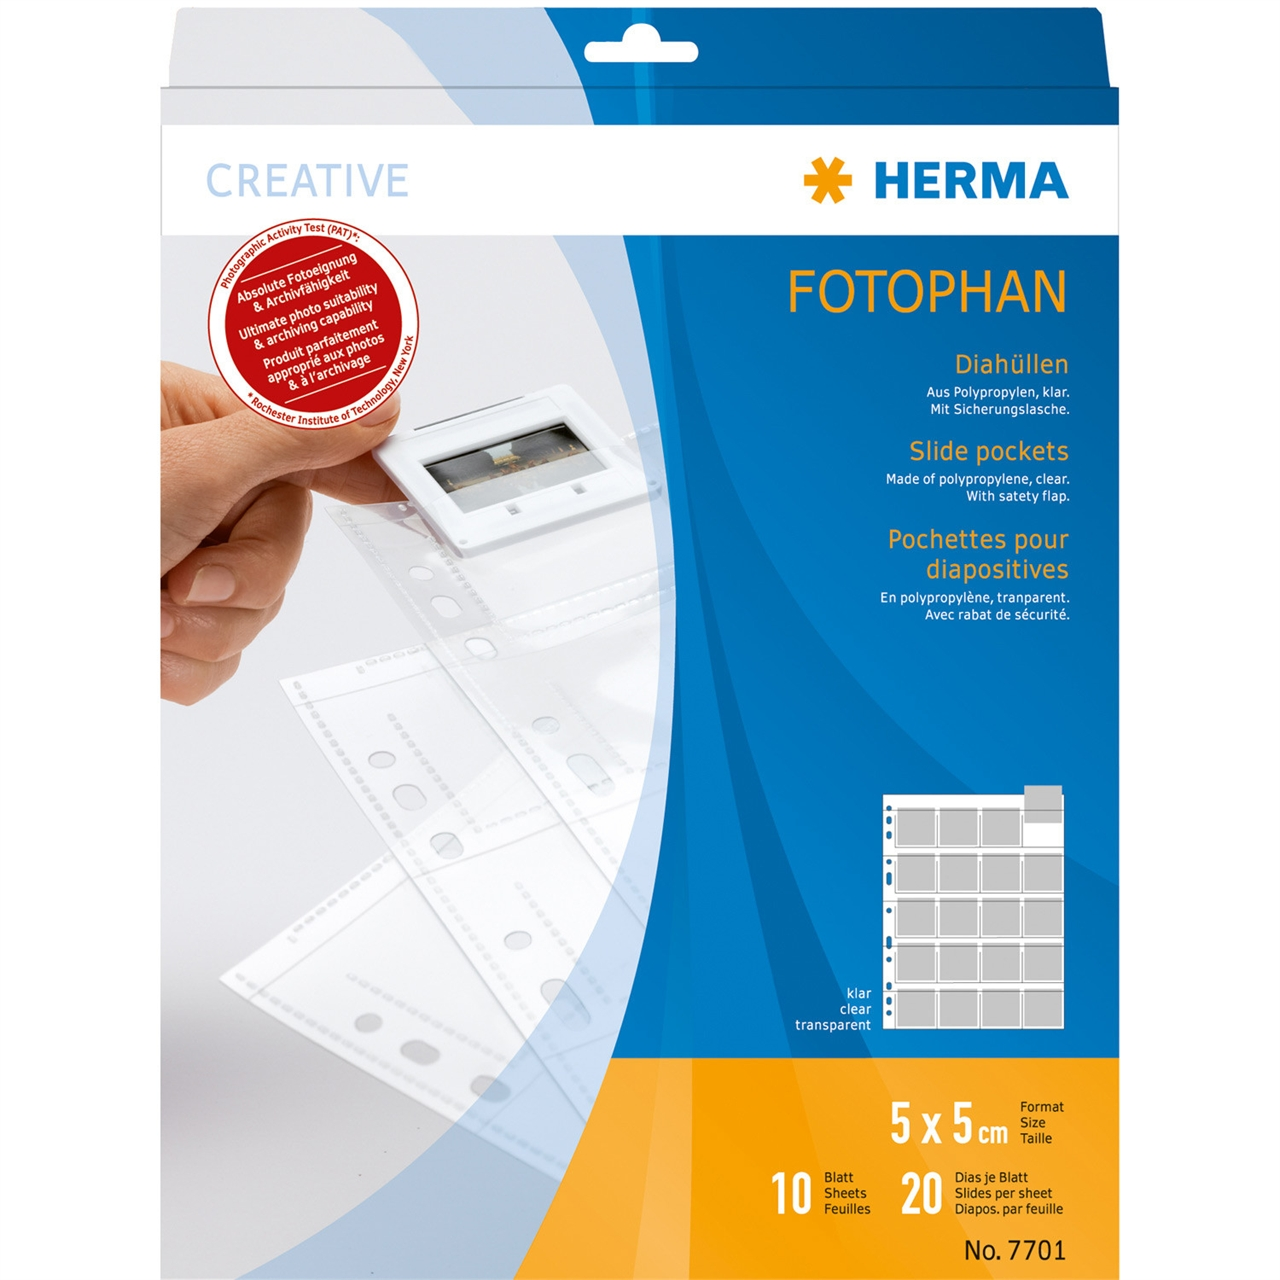 Afbeelding van Herma kleinbeeld dia opbergbladen helder-helder 10 stuks Herma 7701 art.nr. 54365